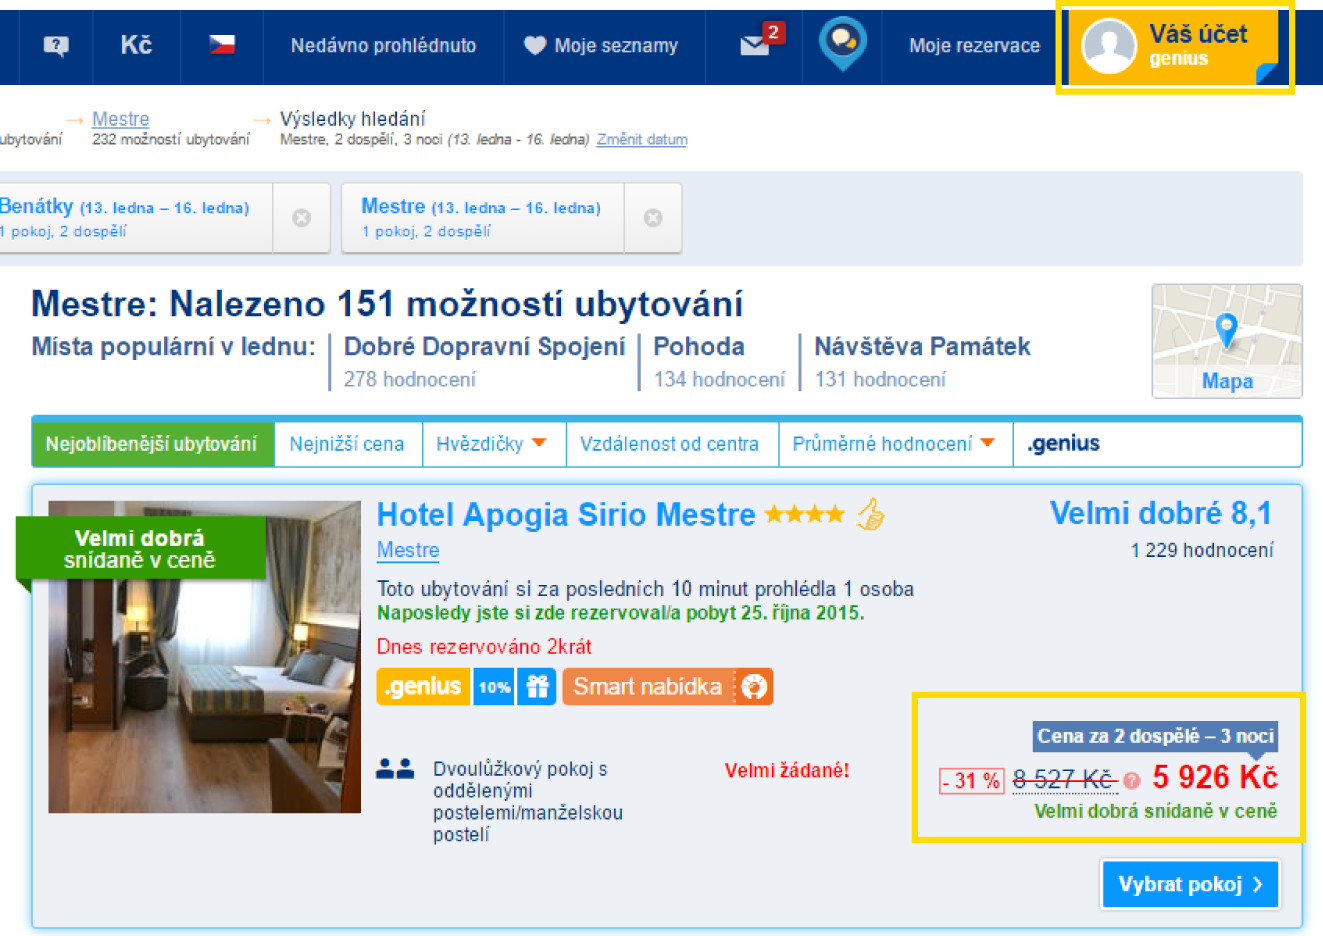 3 noci v hotelu Apogia Sirio Mestre po přihlášení – 5 926 Kč